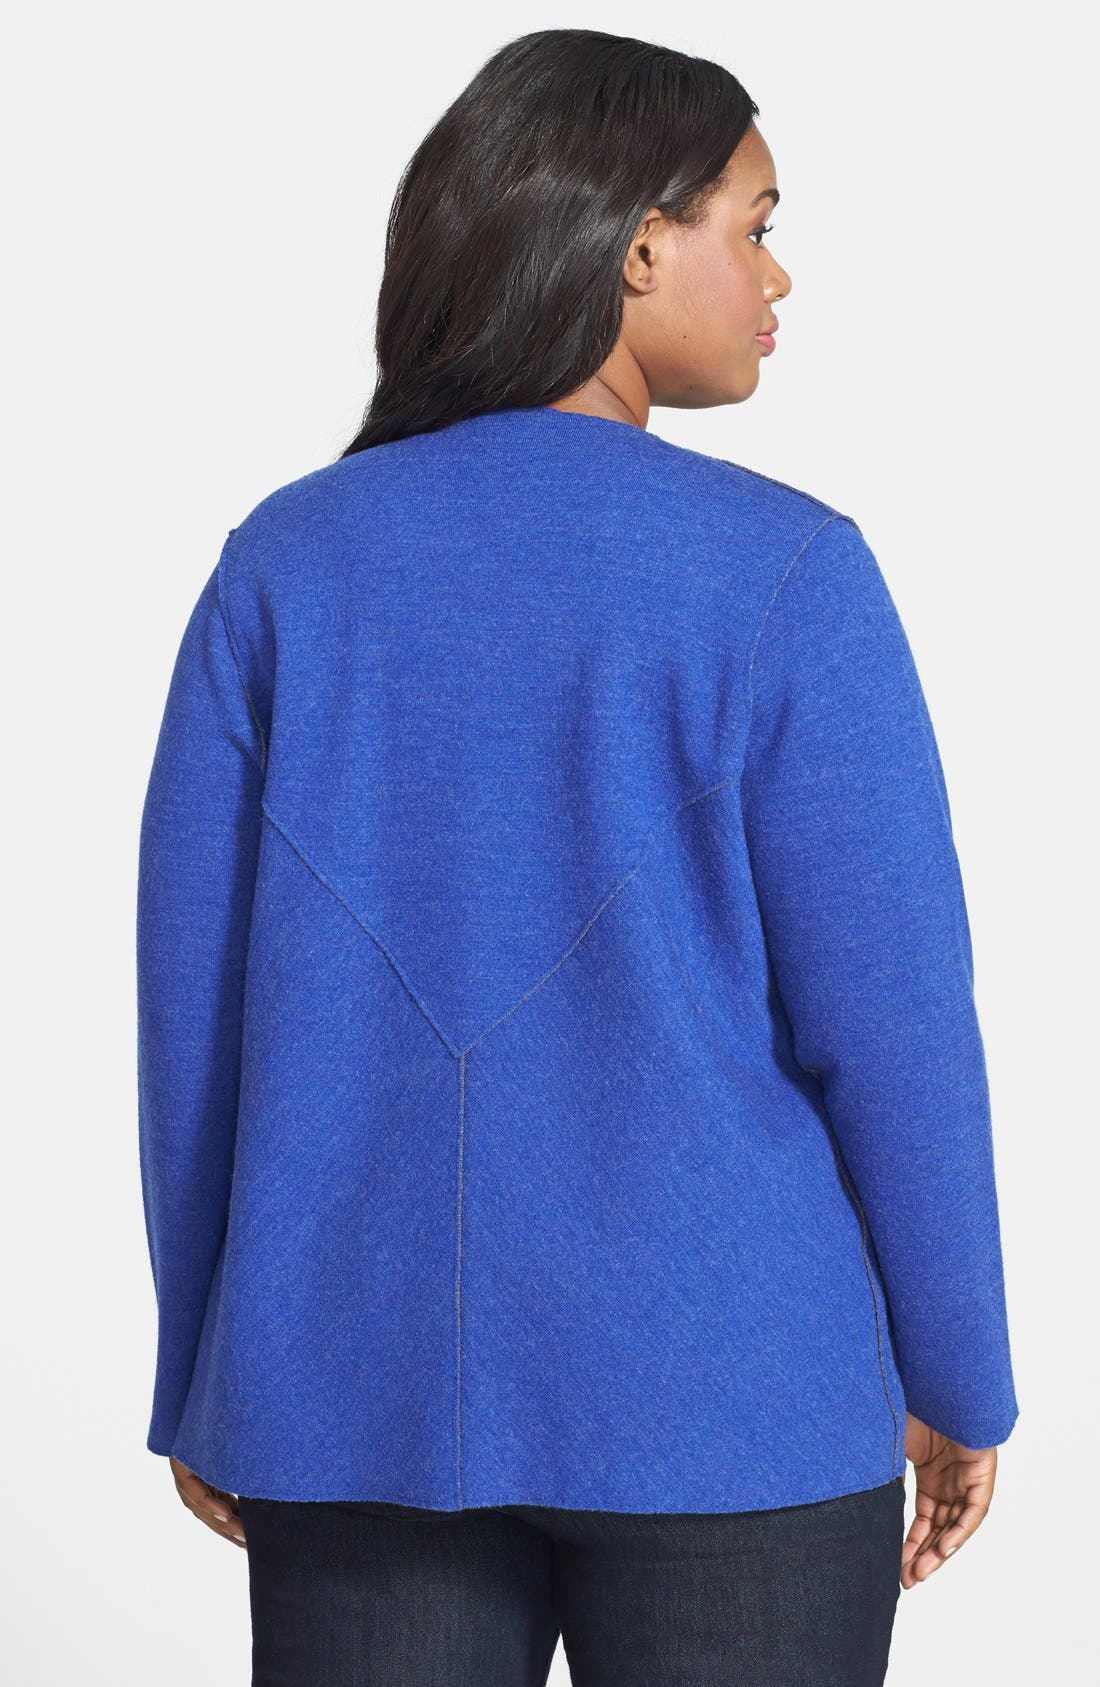 Alternate Image 2  - Eileen Fisher Double Knit Merino Blend Shaped Cardigan (Plus Size)